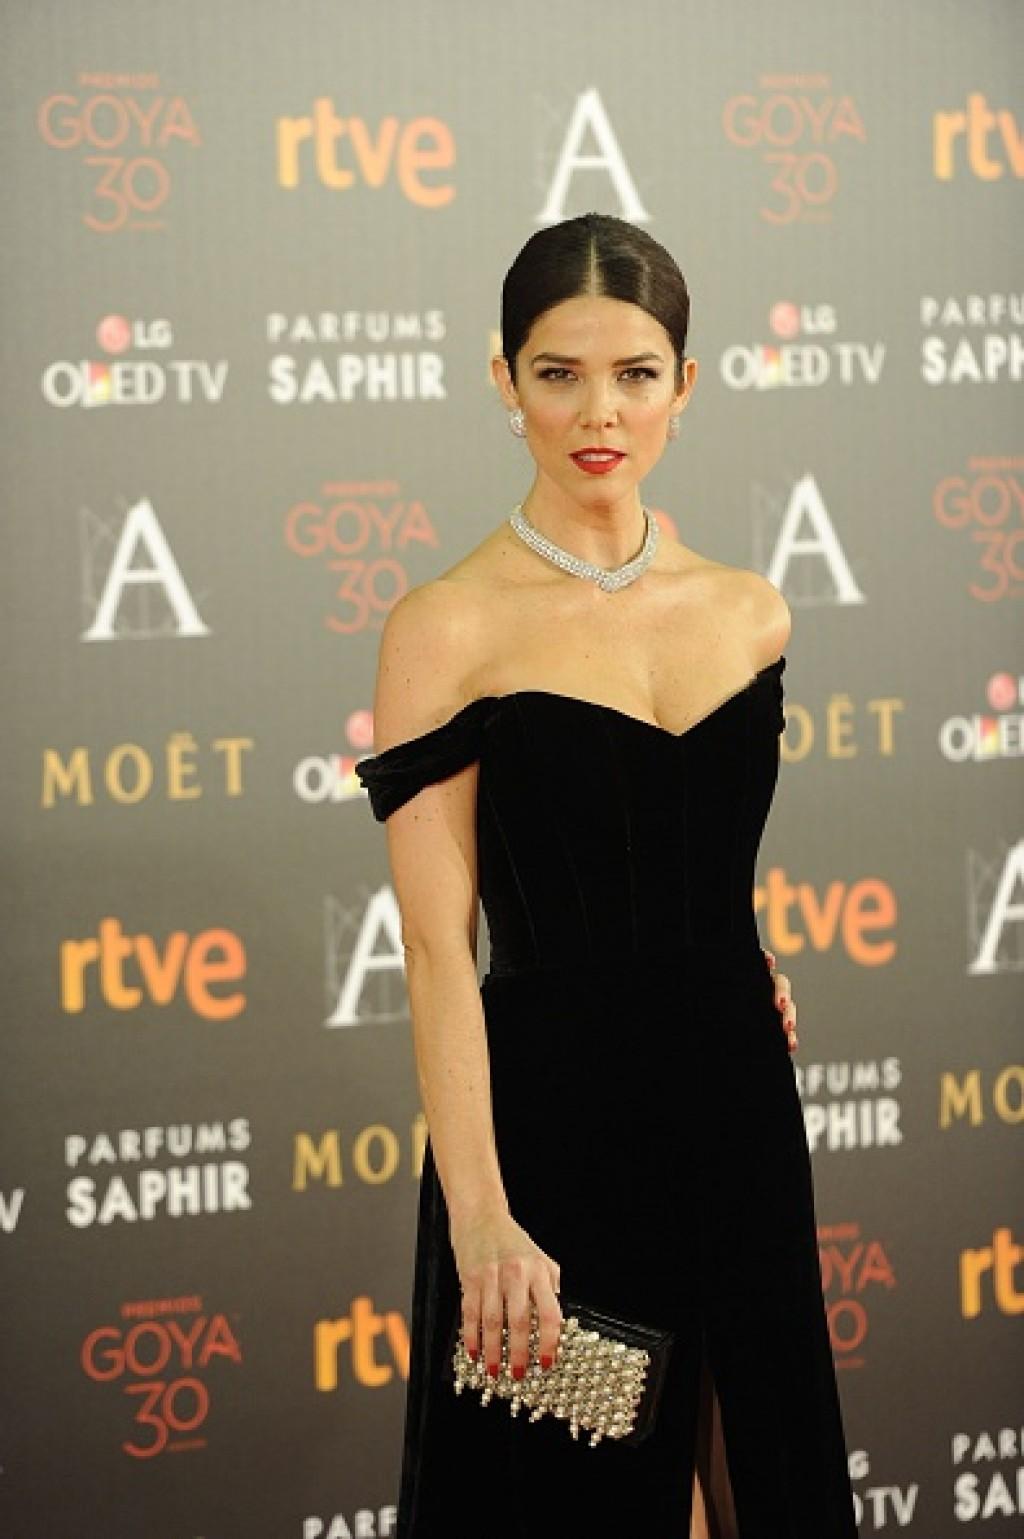 Goya-Cinema-Awards-2016-Juana-Acosta-Gown-half-1024x1539-1